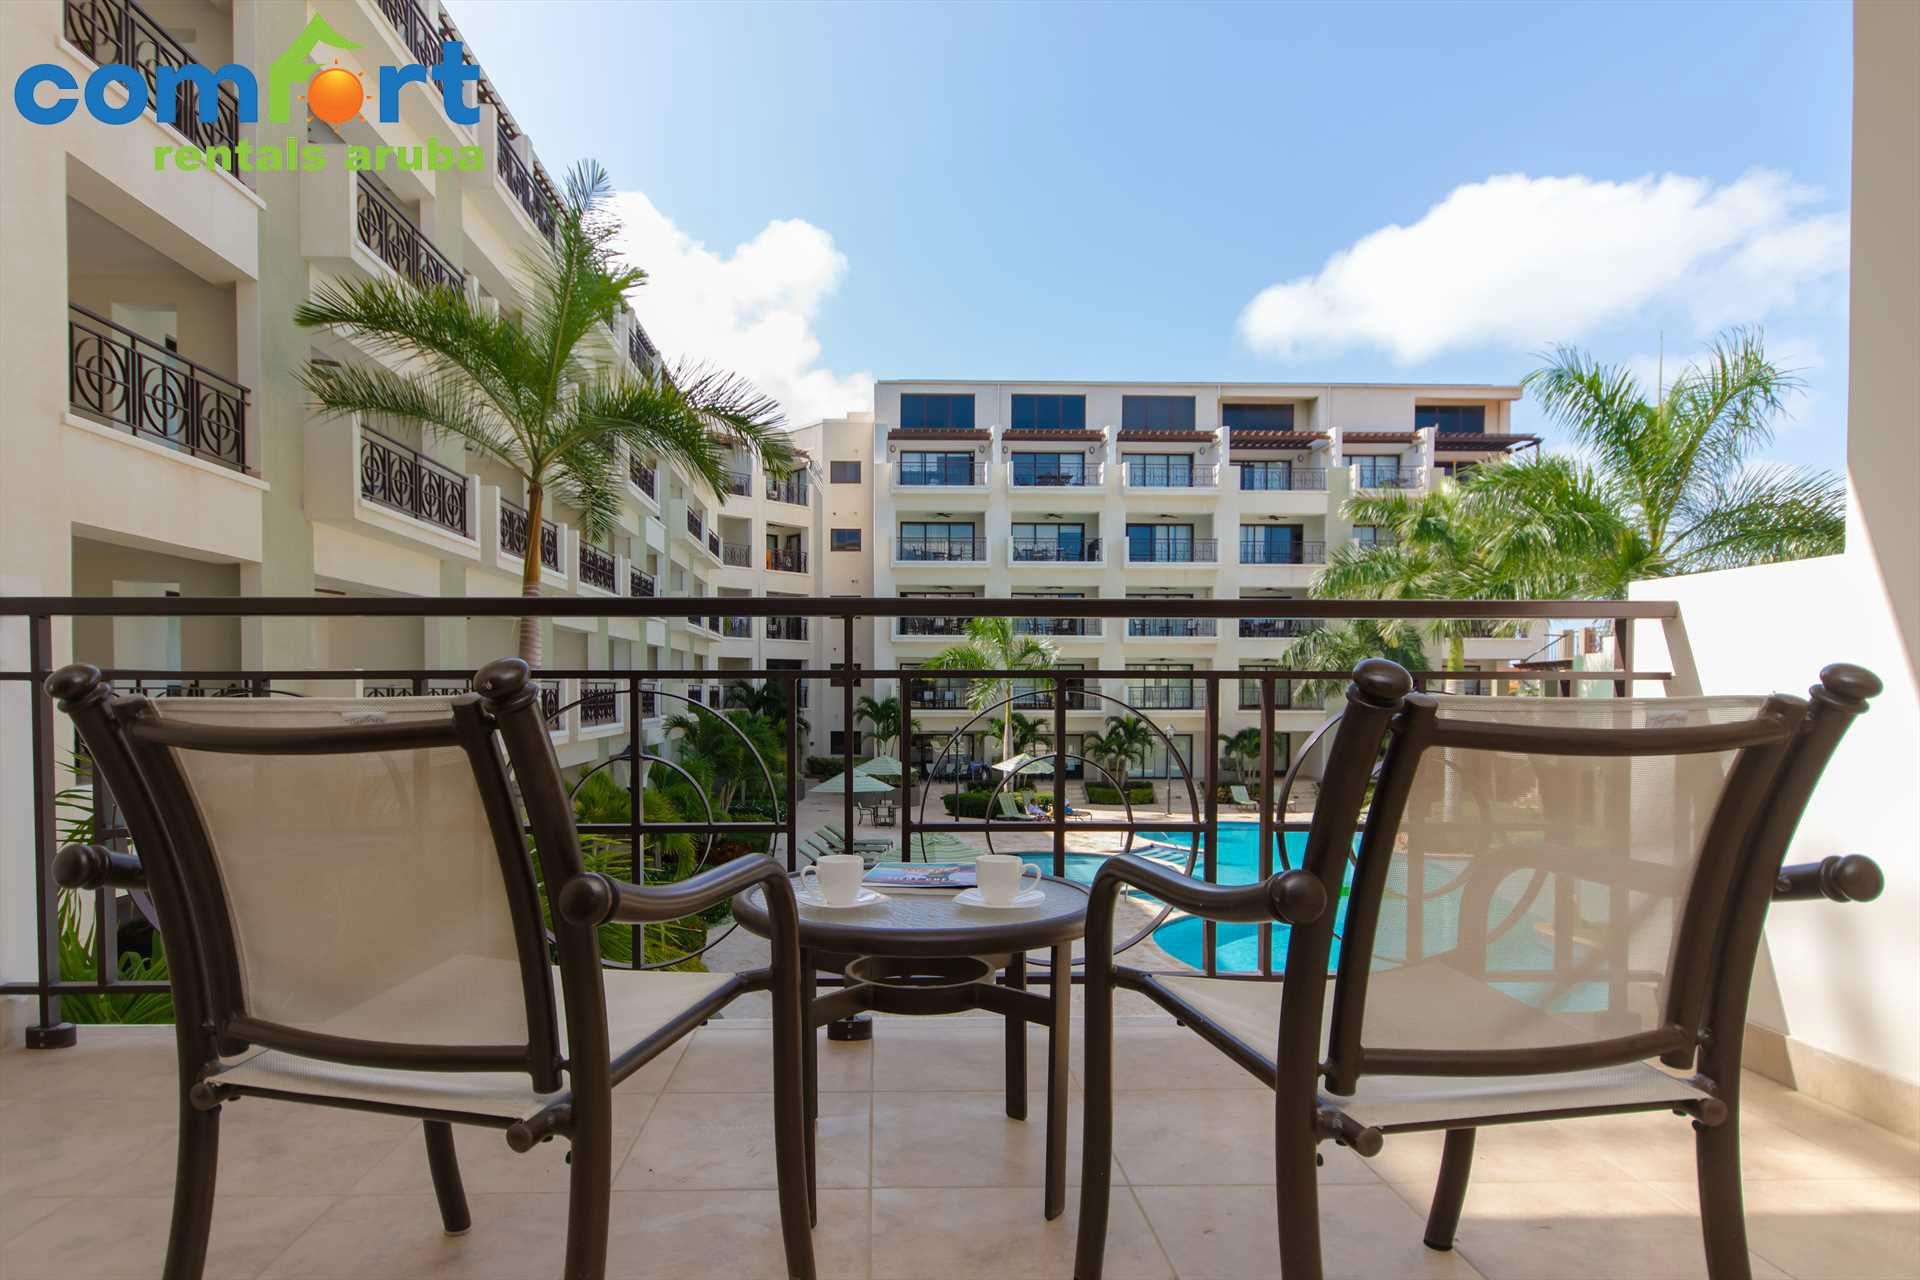 Paradise awaits at the Mazari Palm Two-bedroom condo